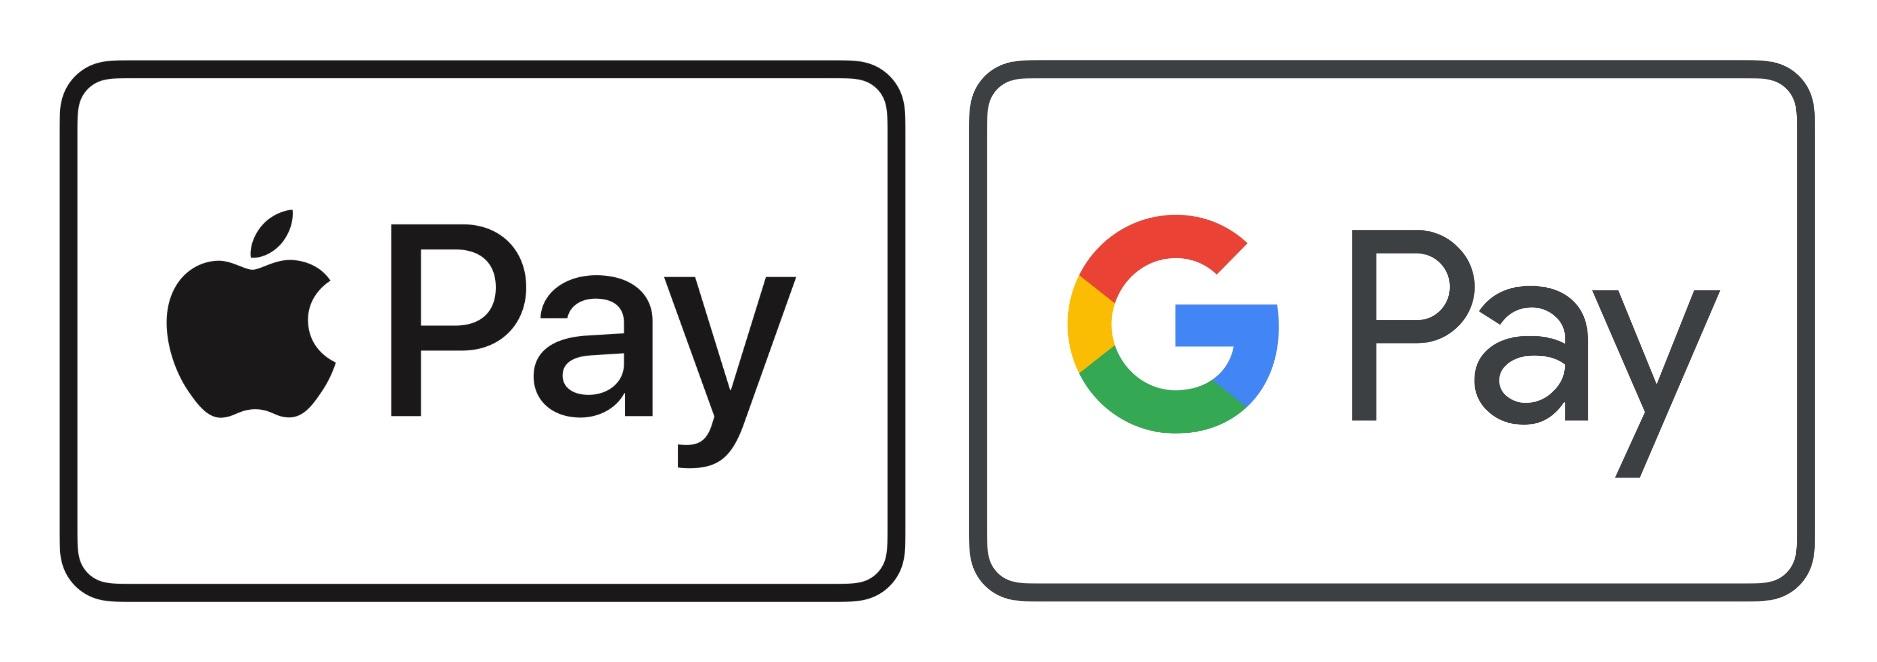 google pay apple pay logo